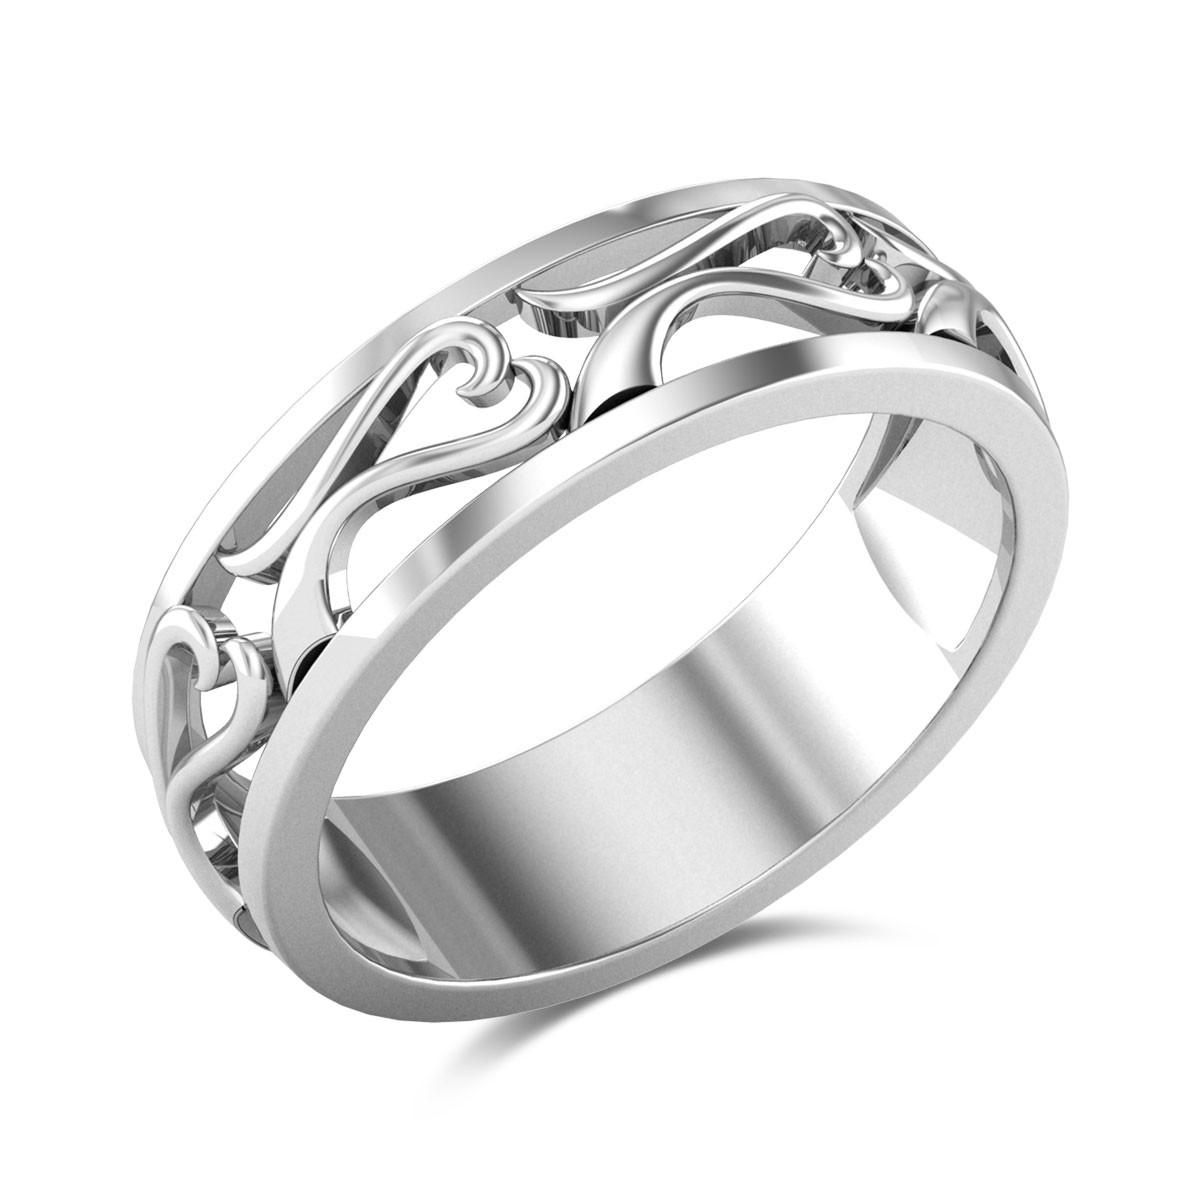 Boden Gold Ring